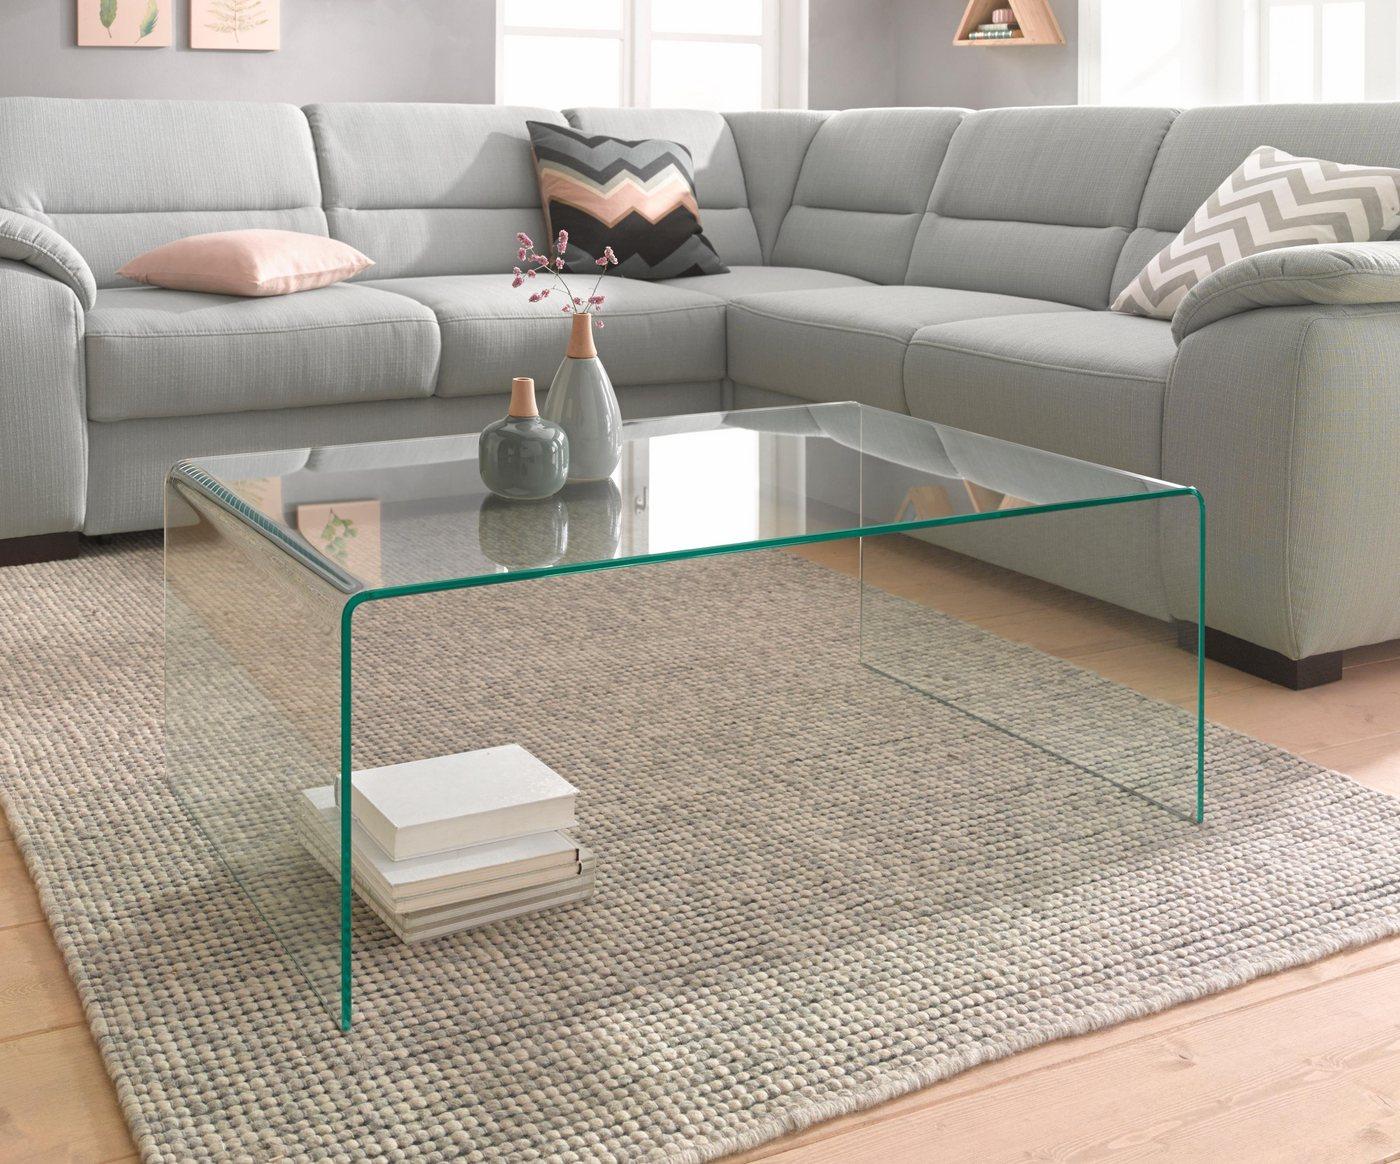 Salontafel van vensterglas